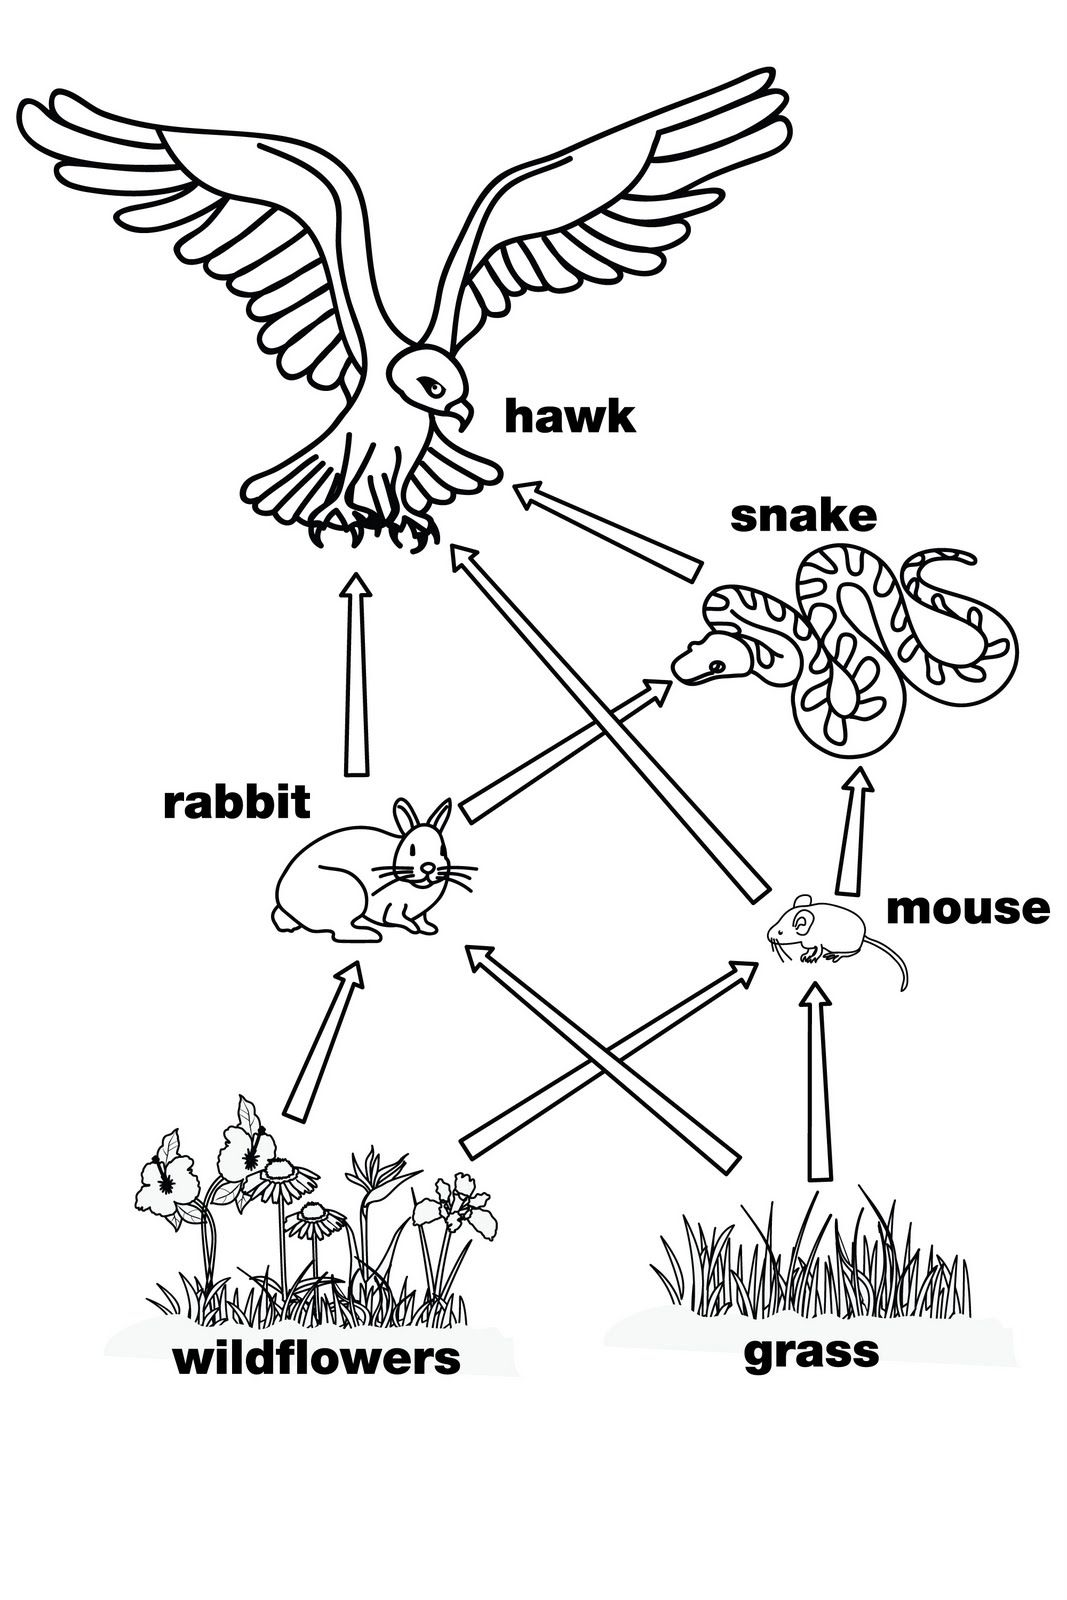 food web diagram  complex food web  energy flow through a